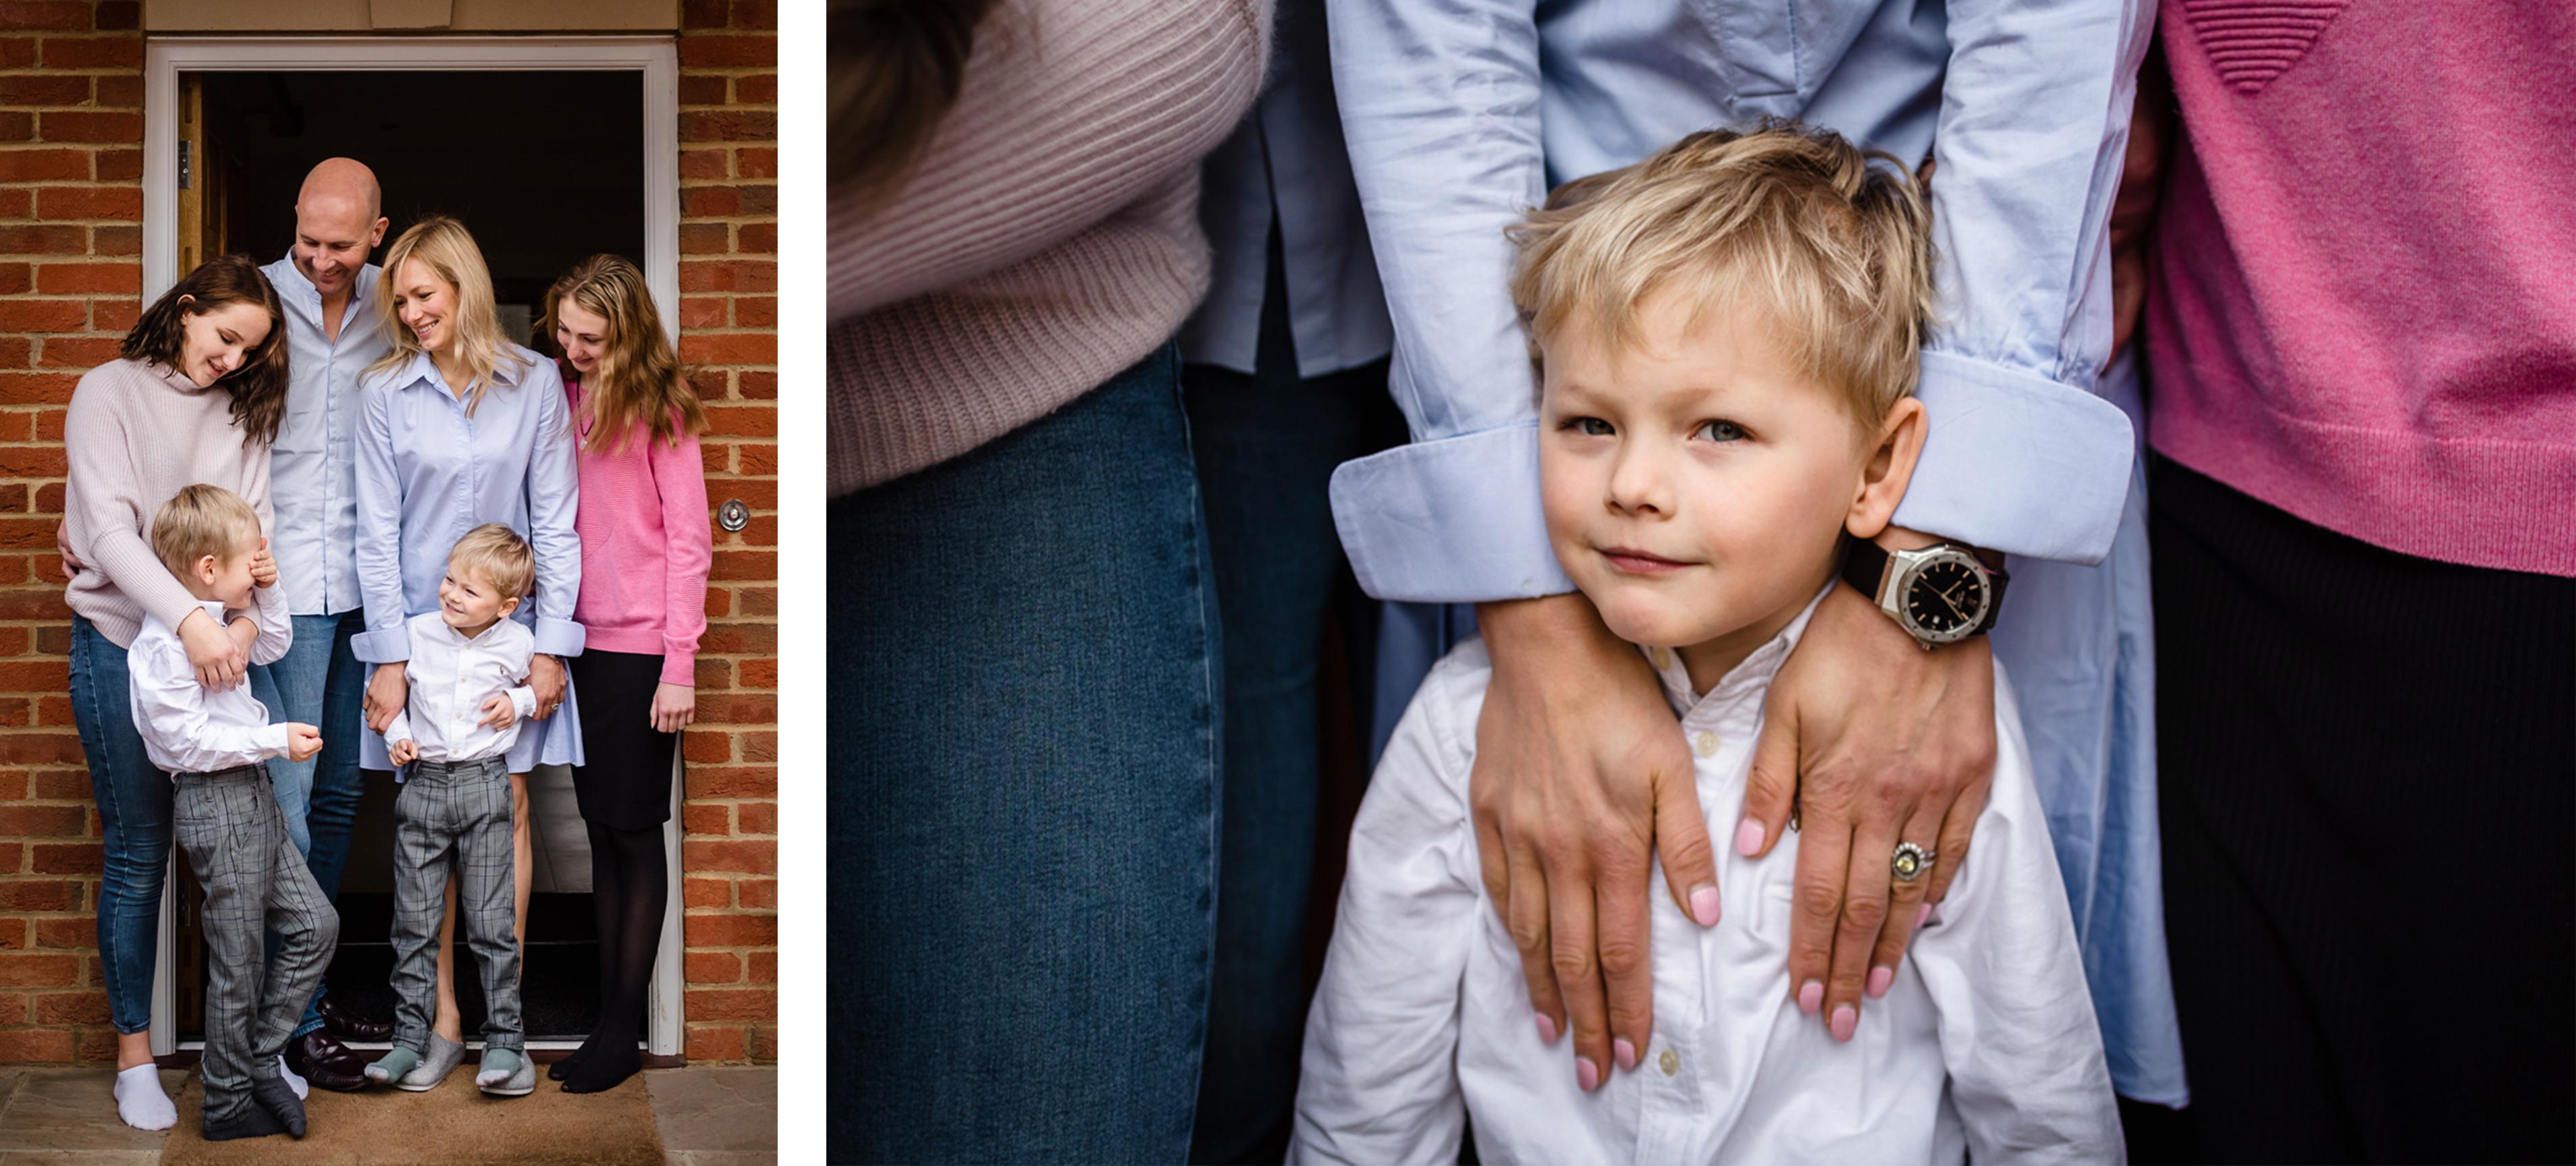 Amersham Buckinghamshire Beaconsfield family fine art lifestyle photography